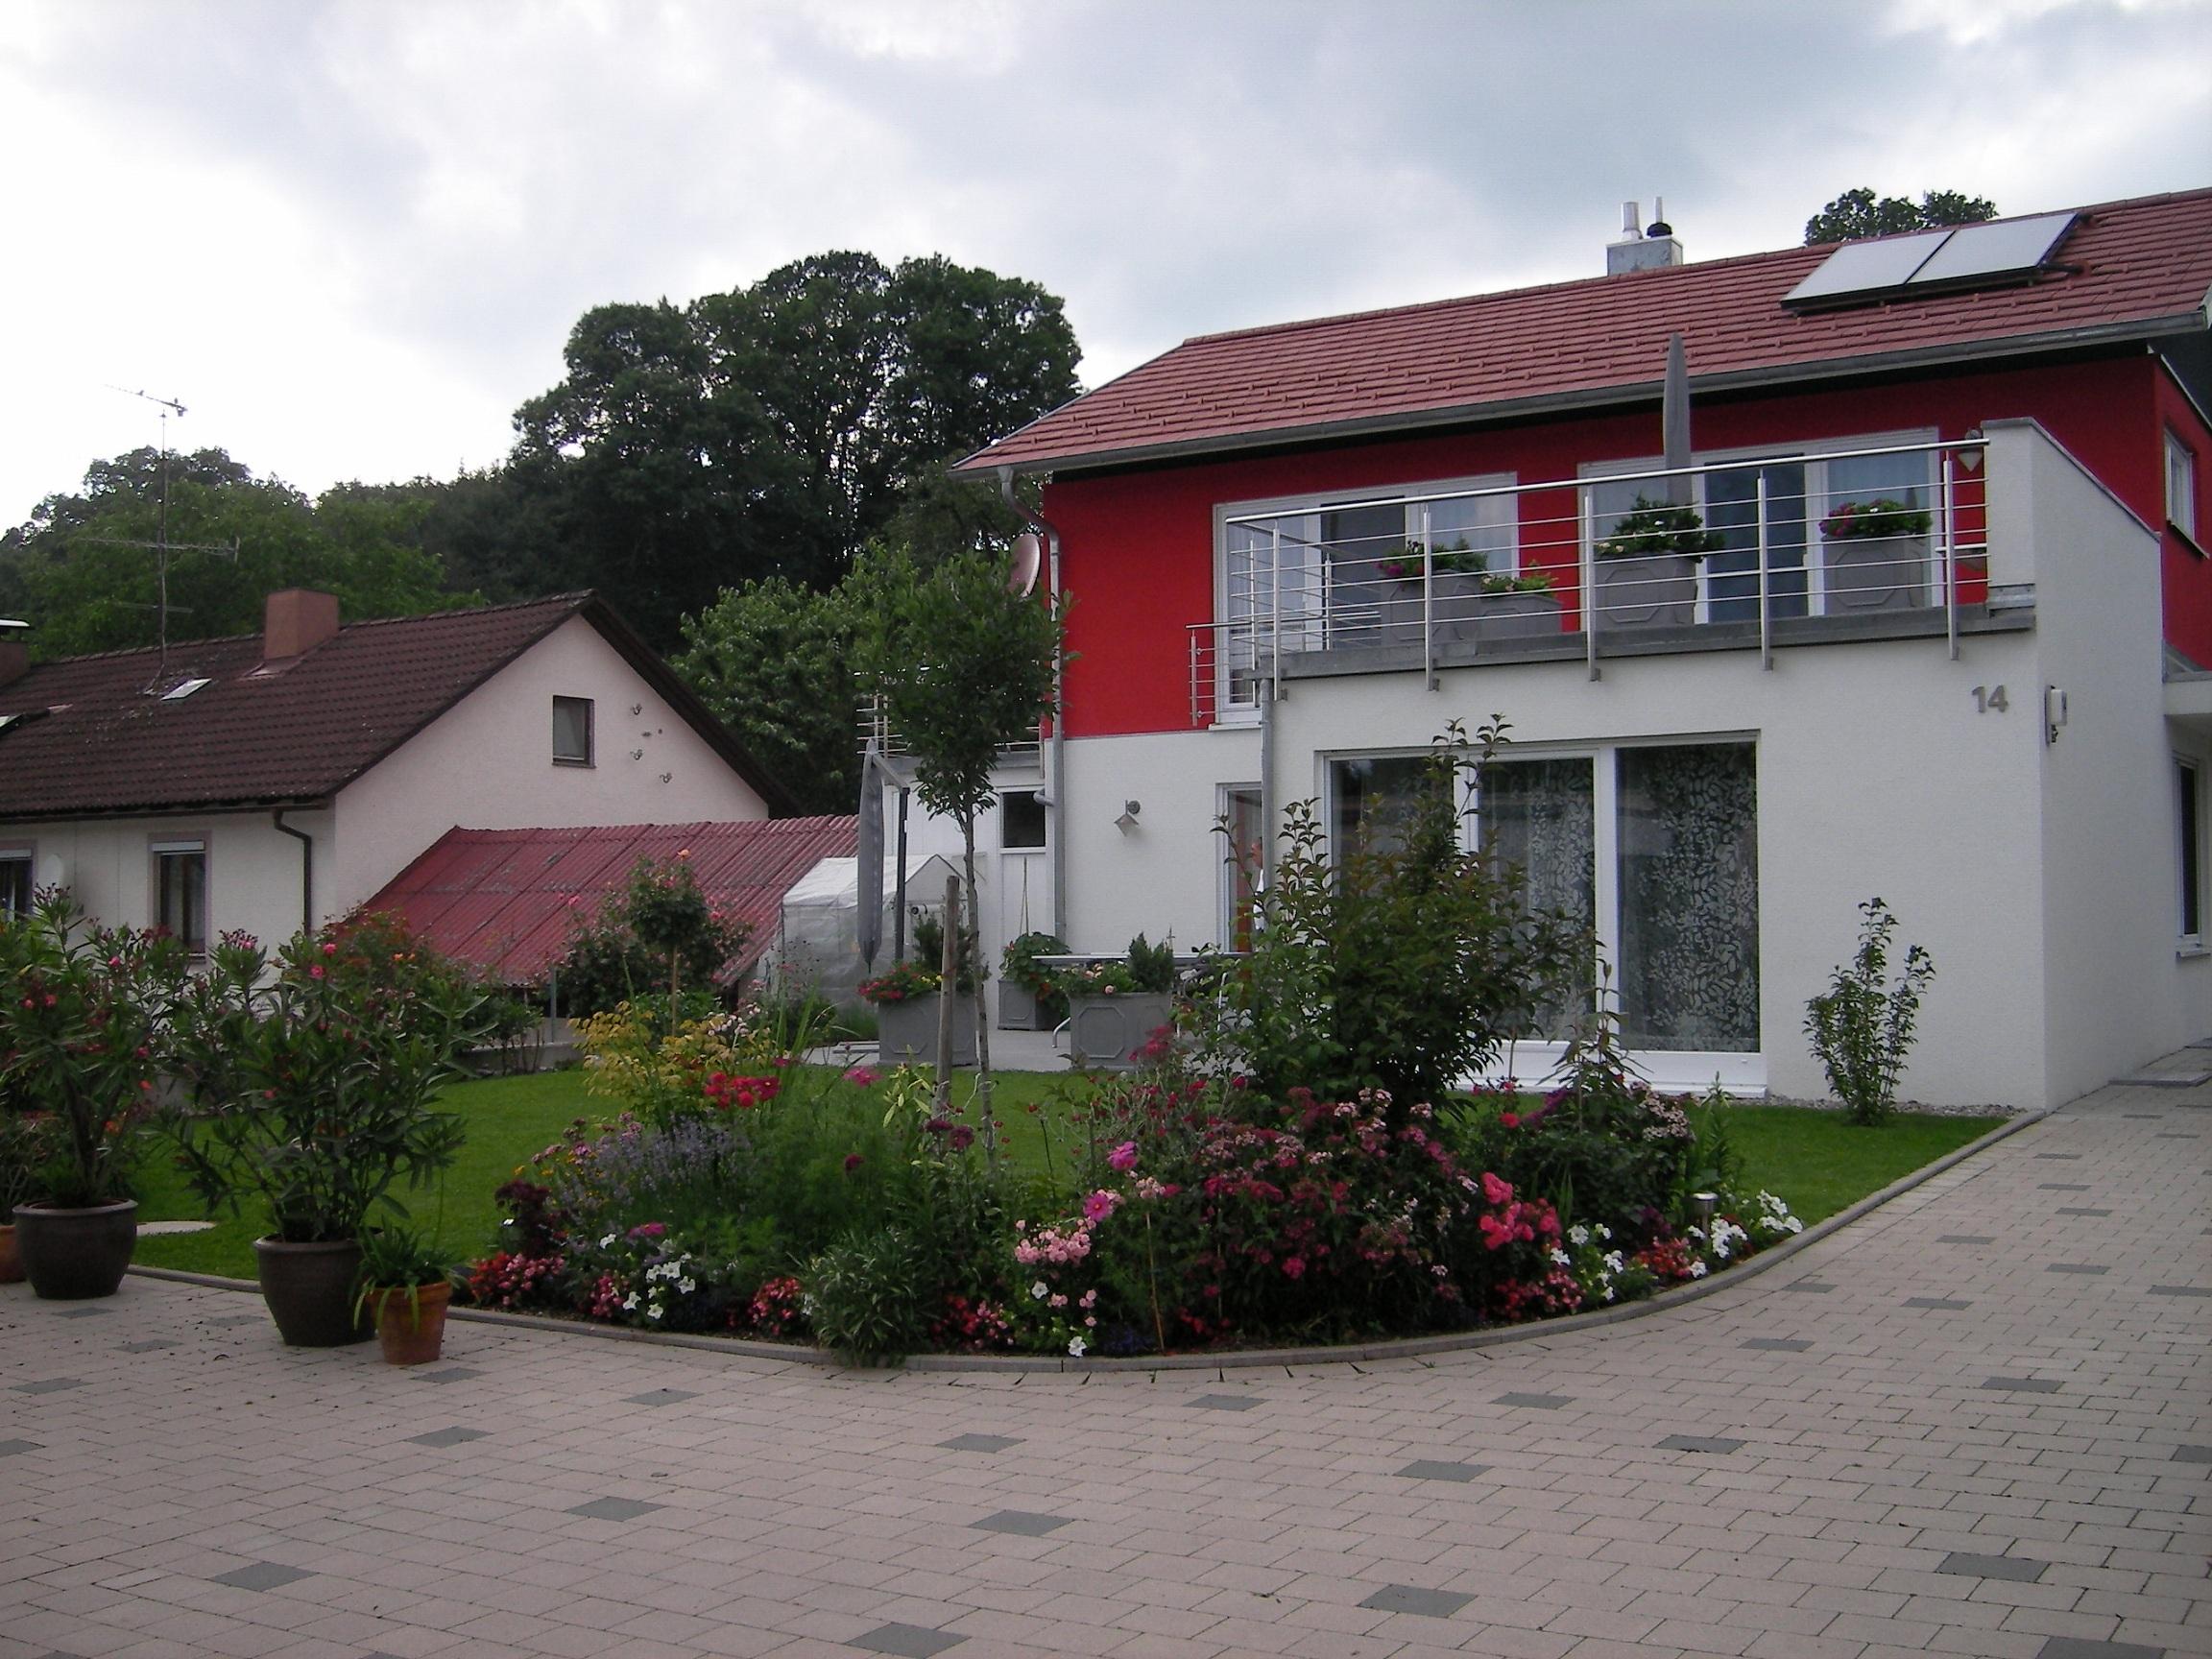 Neubau eines Einfamilienhauses inNeuravensburg